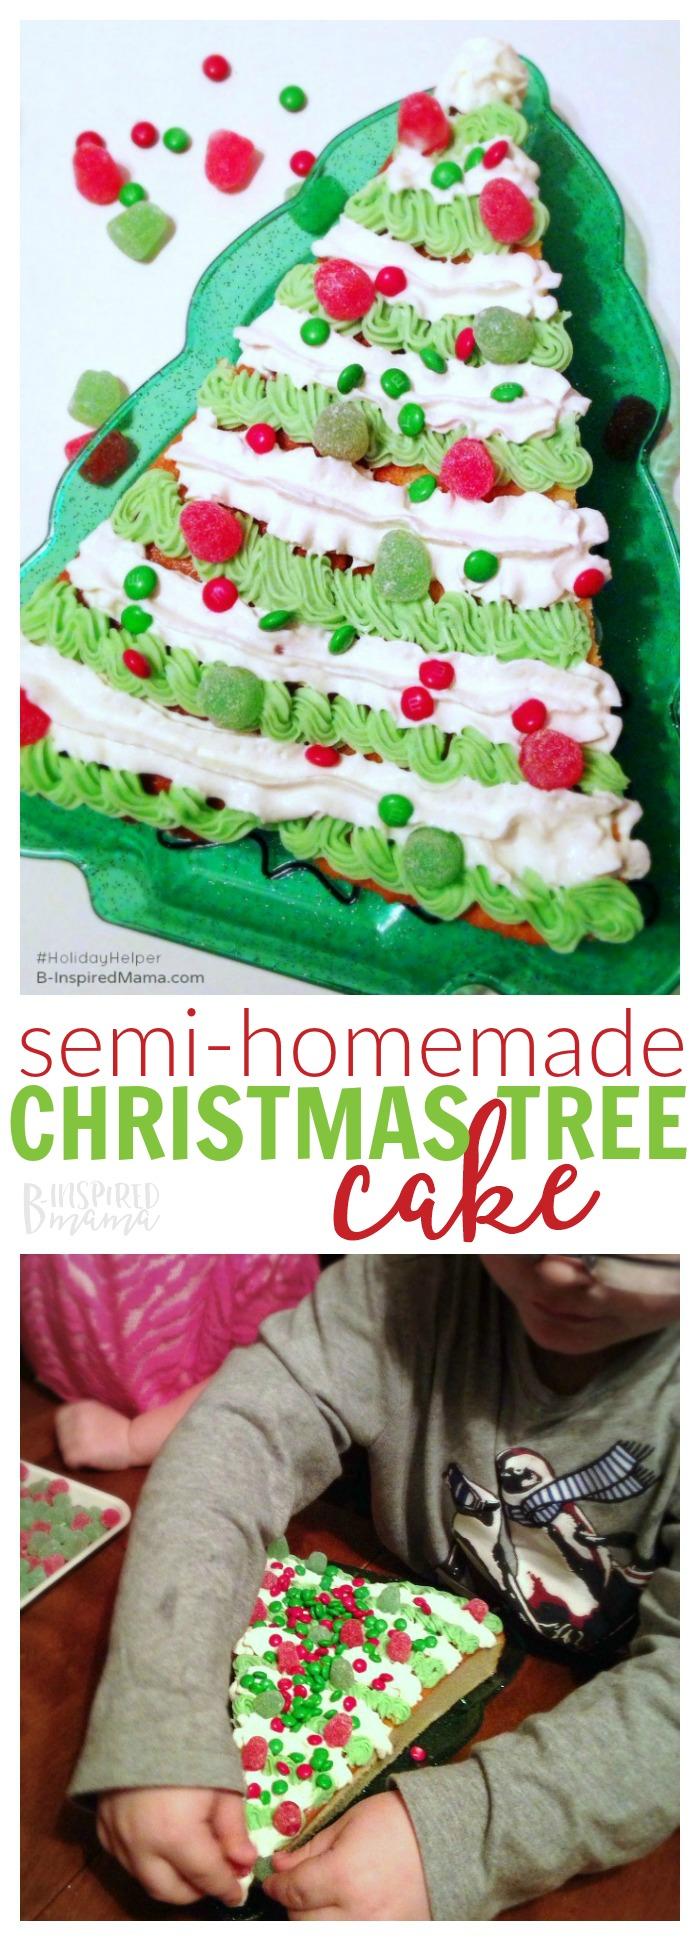 Semi Homemade Christmas Tree Shaped Christmas Cake Recipe